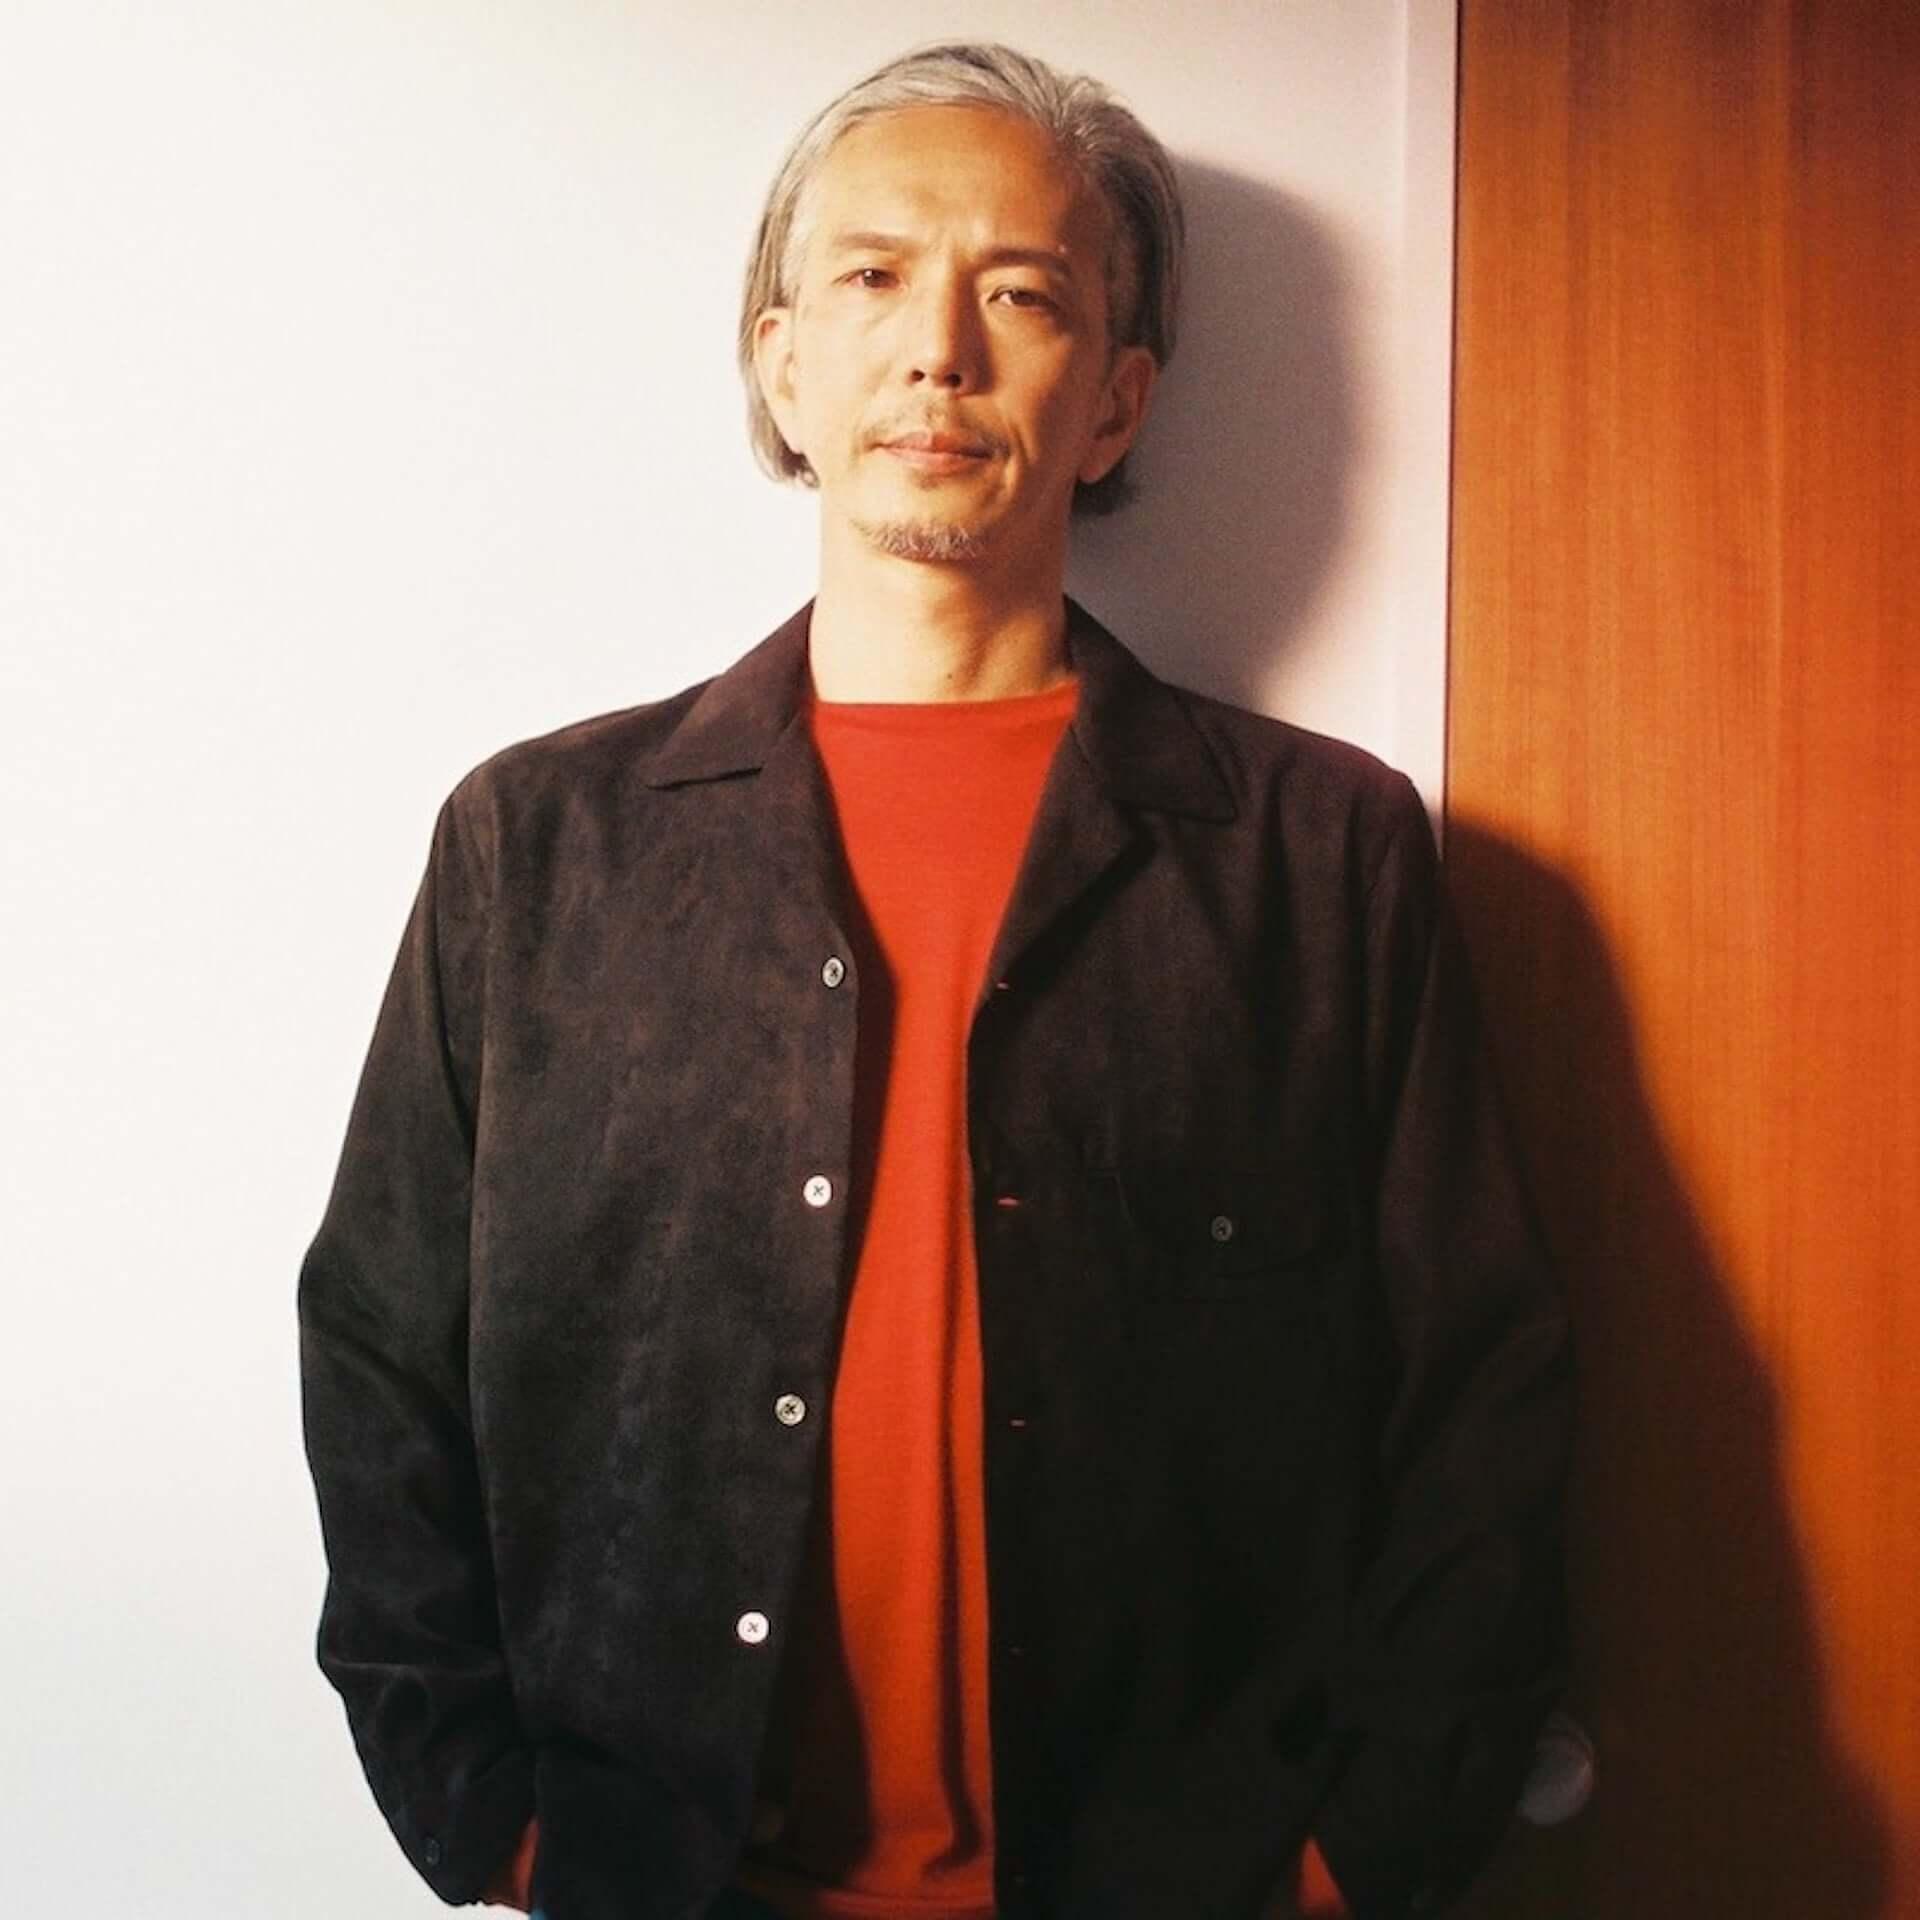 IORI主催テクノパーティー<Galaxy>が渋谷Contactで開催決定!Kaoru Inoue、Tasoko、k_yamらが登場 music201116_contact-galaxy_4-1920x1920